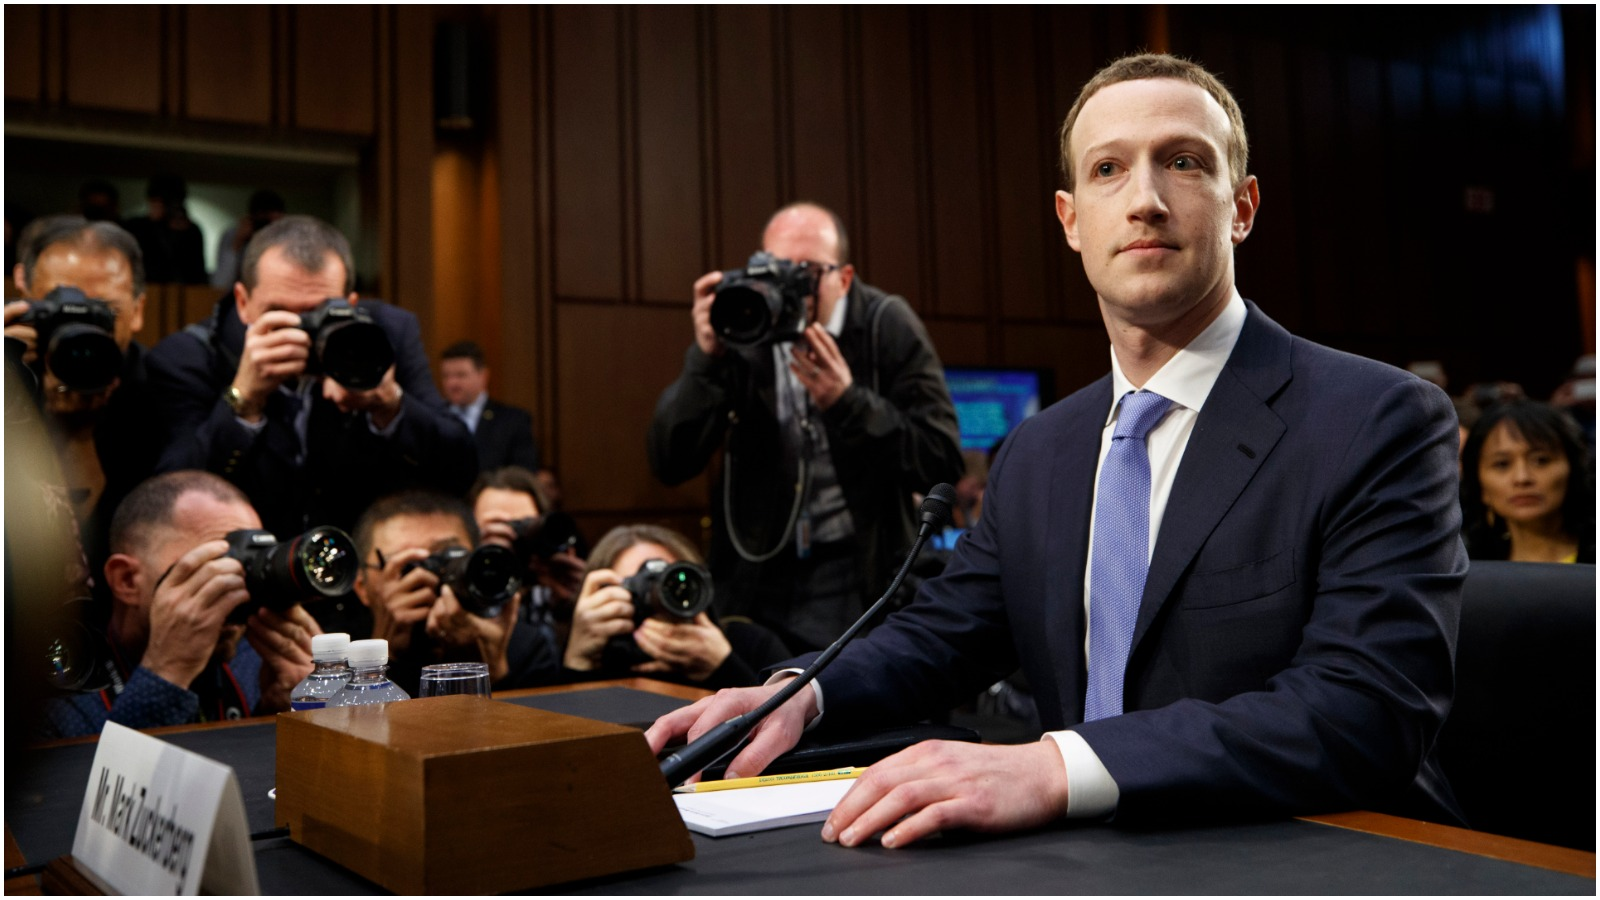 Dan Mygind i RÆSON36: Nu truer teknologien demokratiet